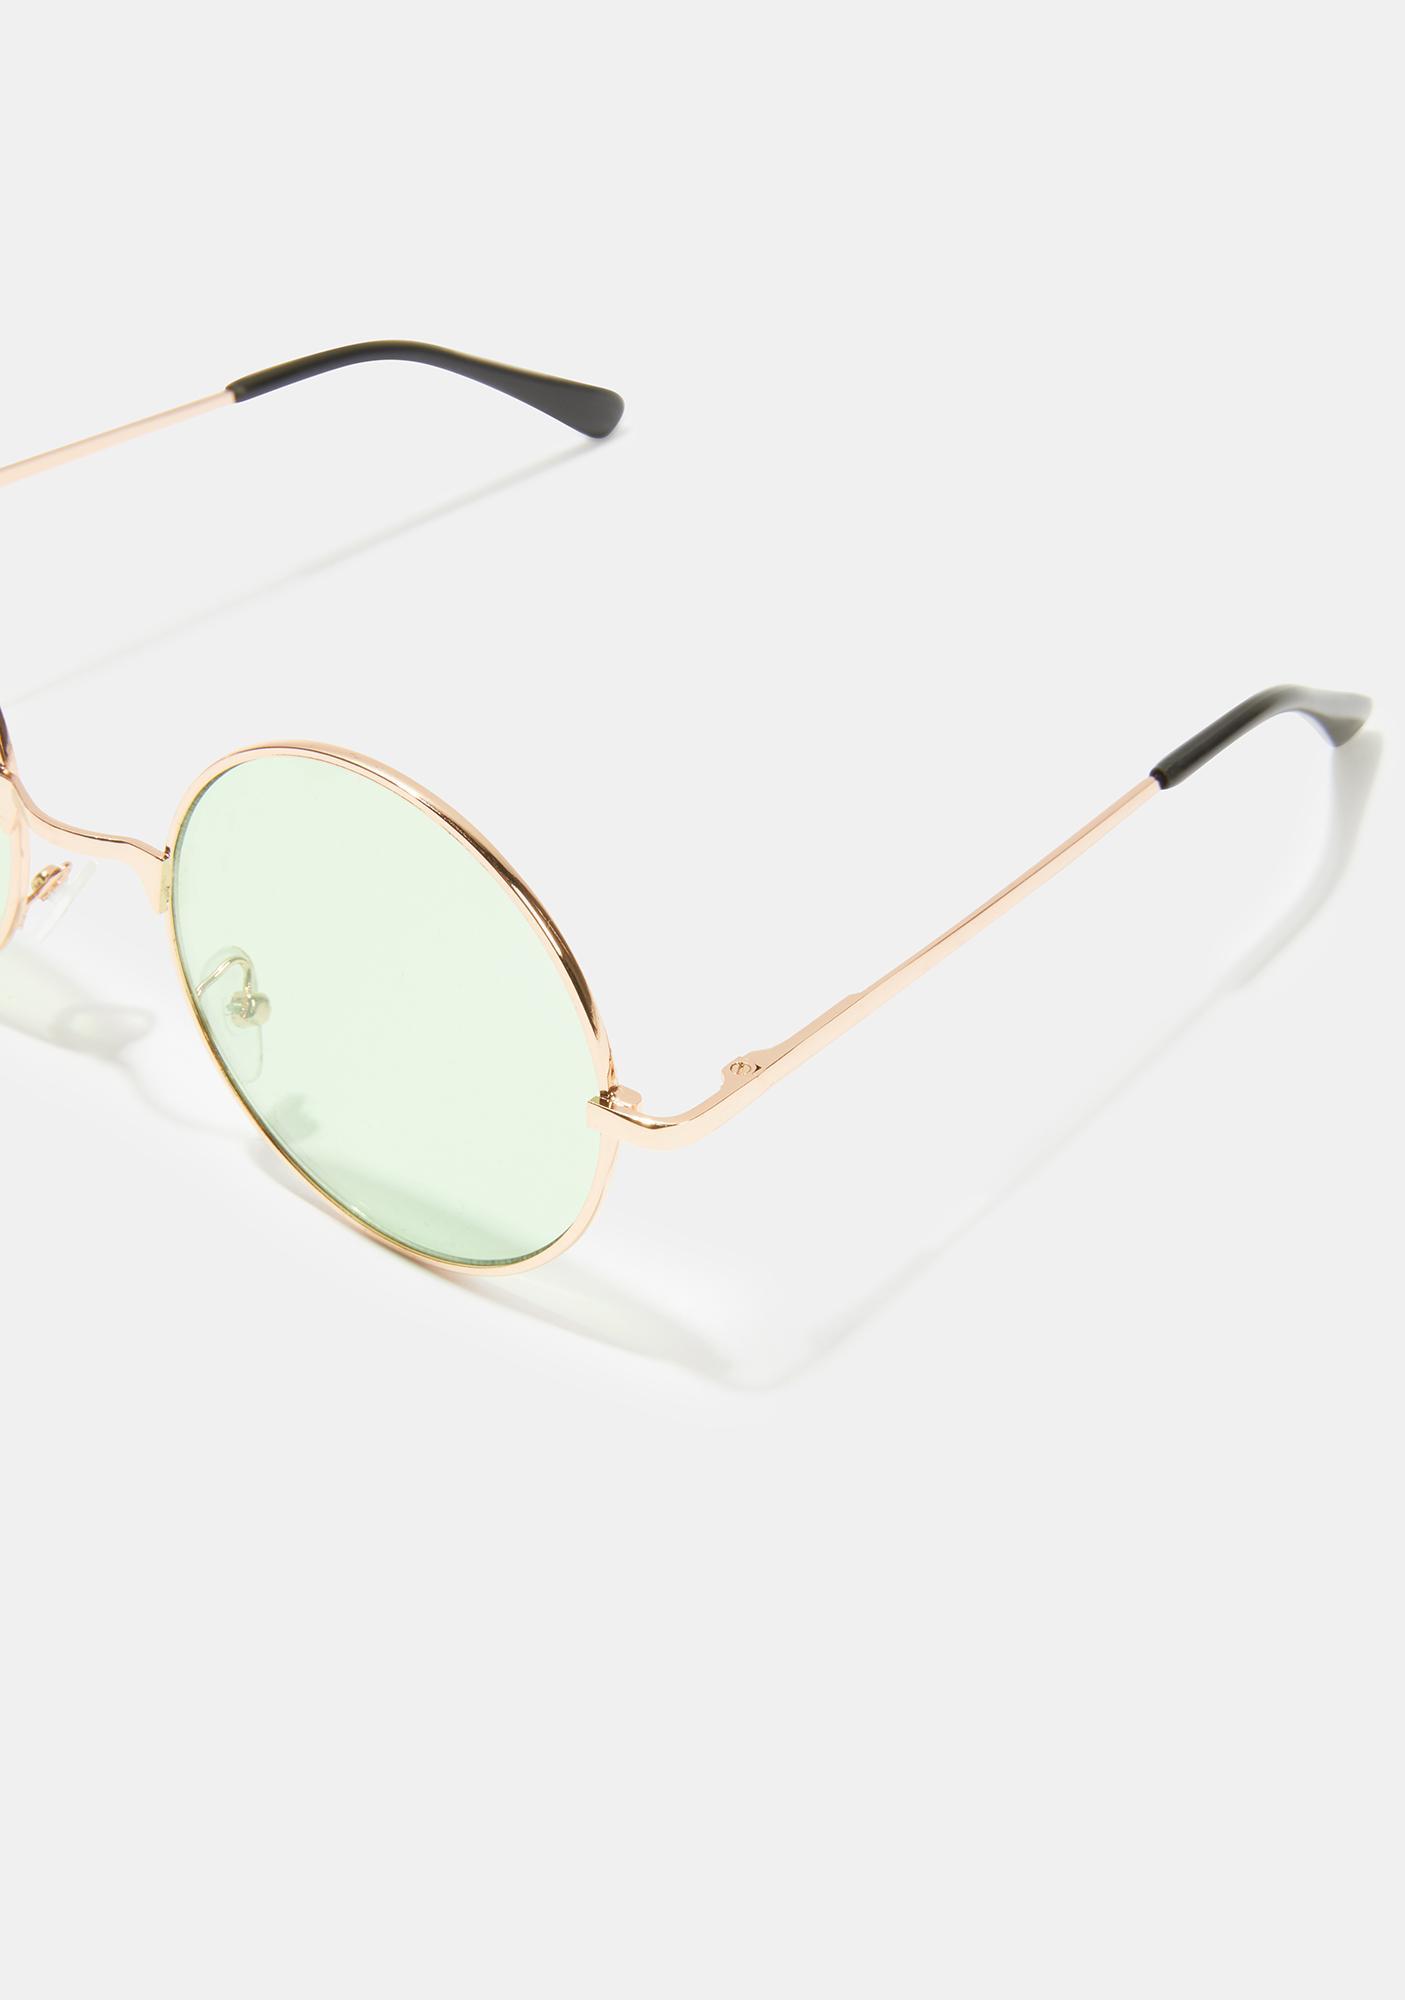 Busy Dreaming Circle Sunglasses